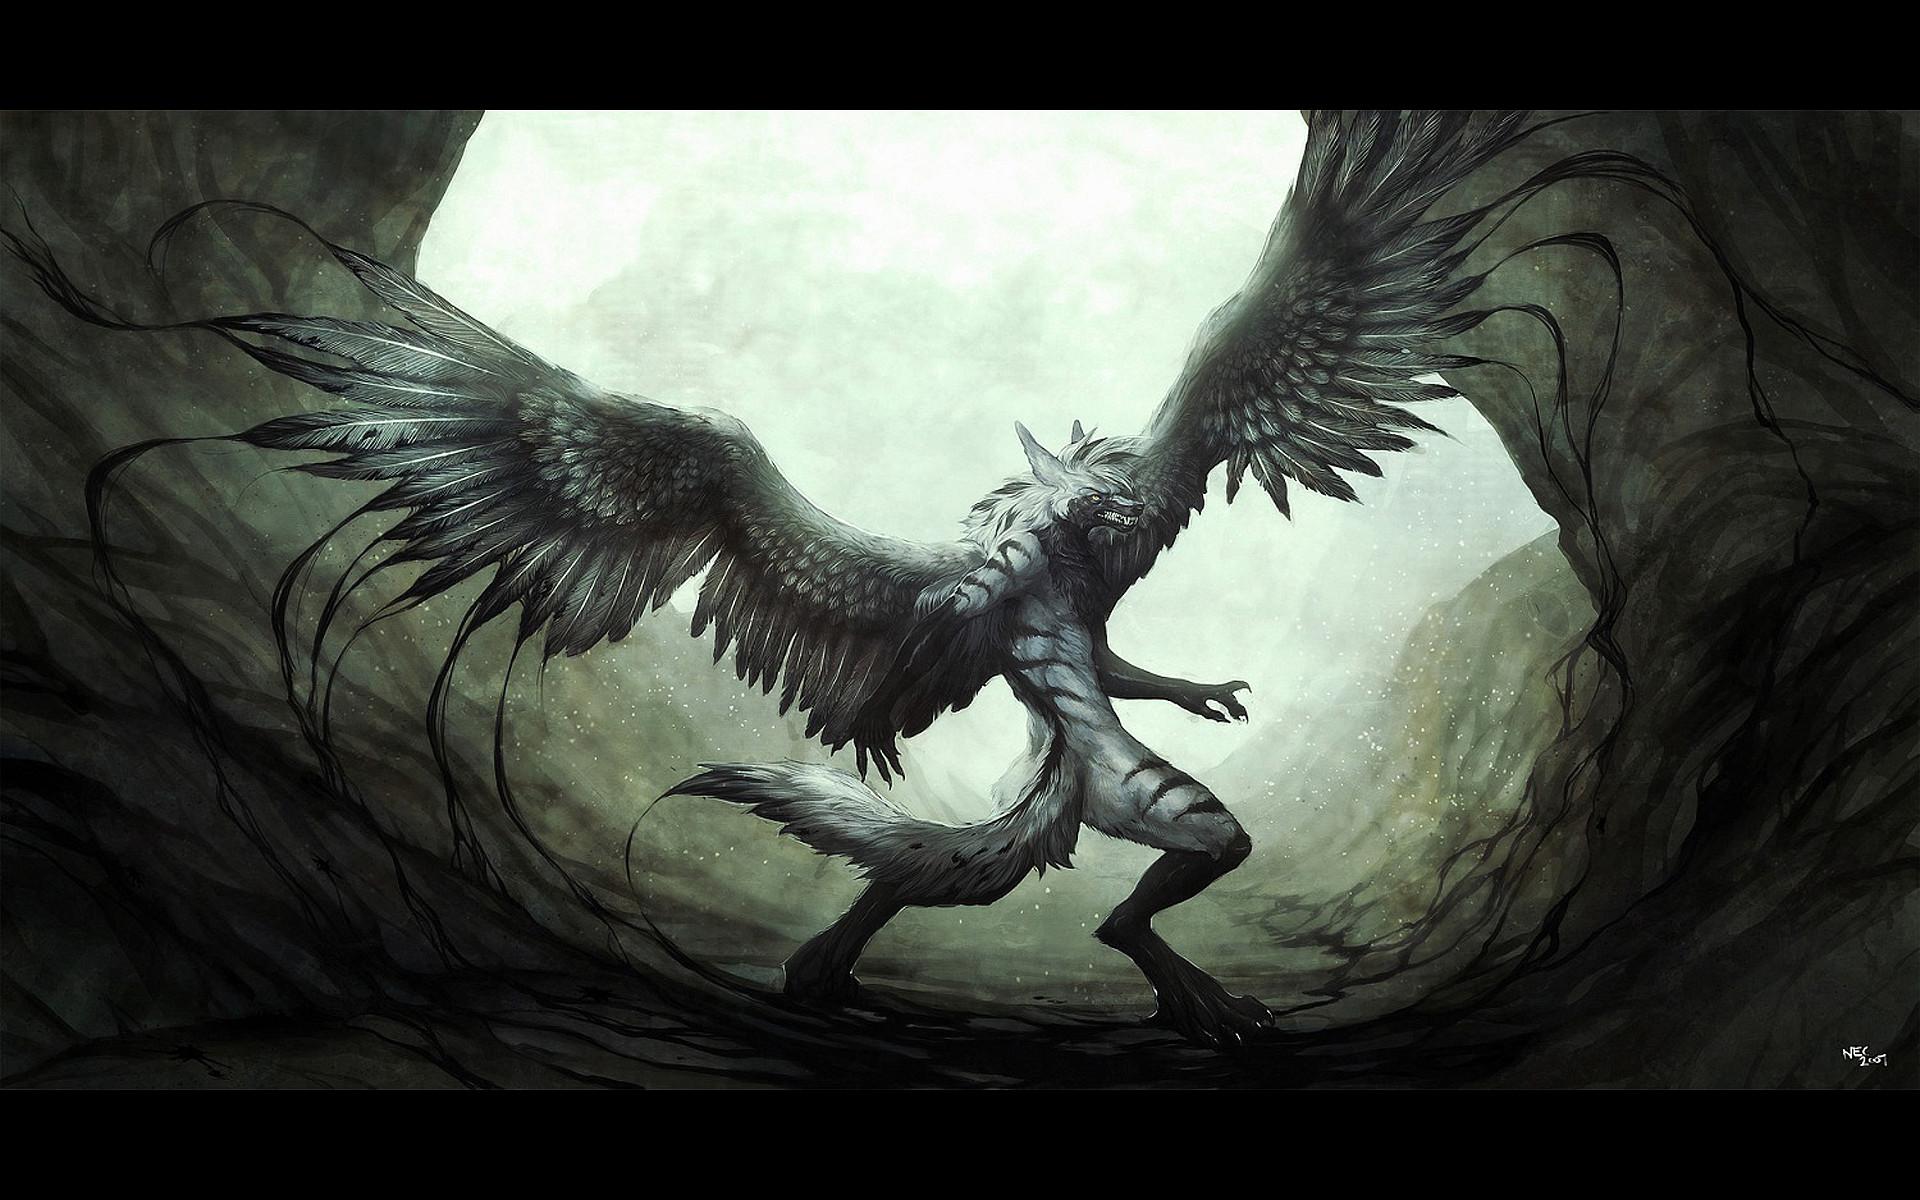 Black Anime Wolf 3 Hd Wallpaper